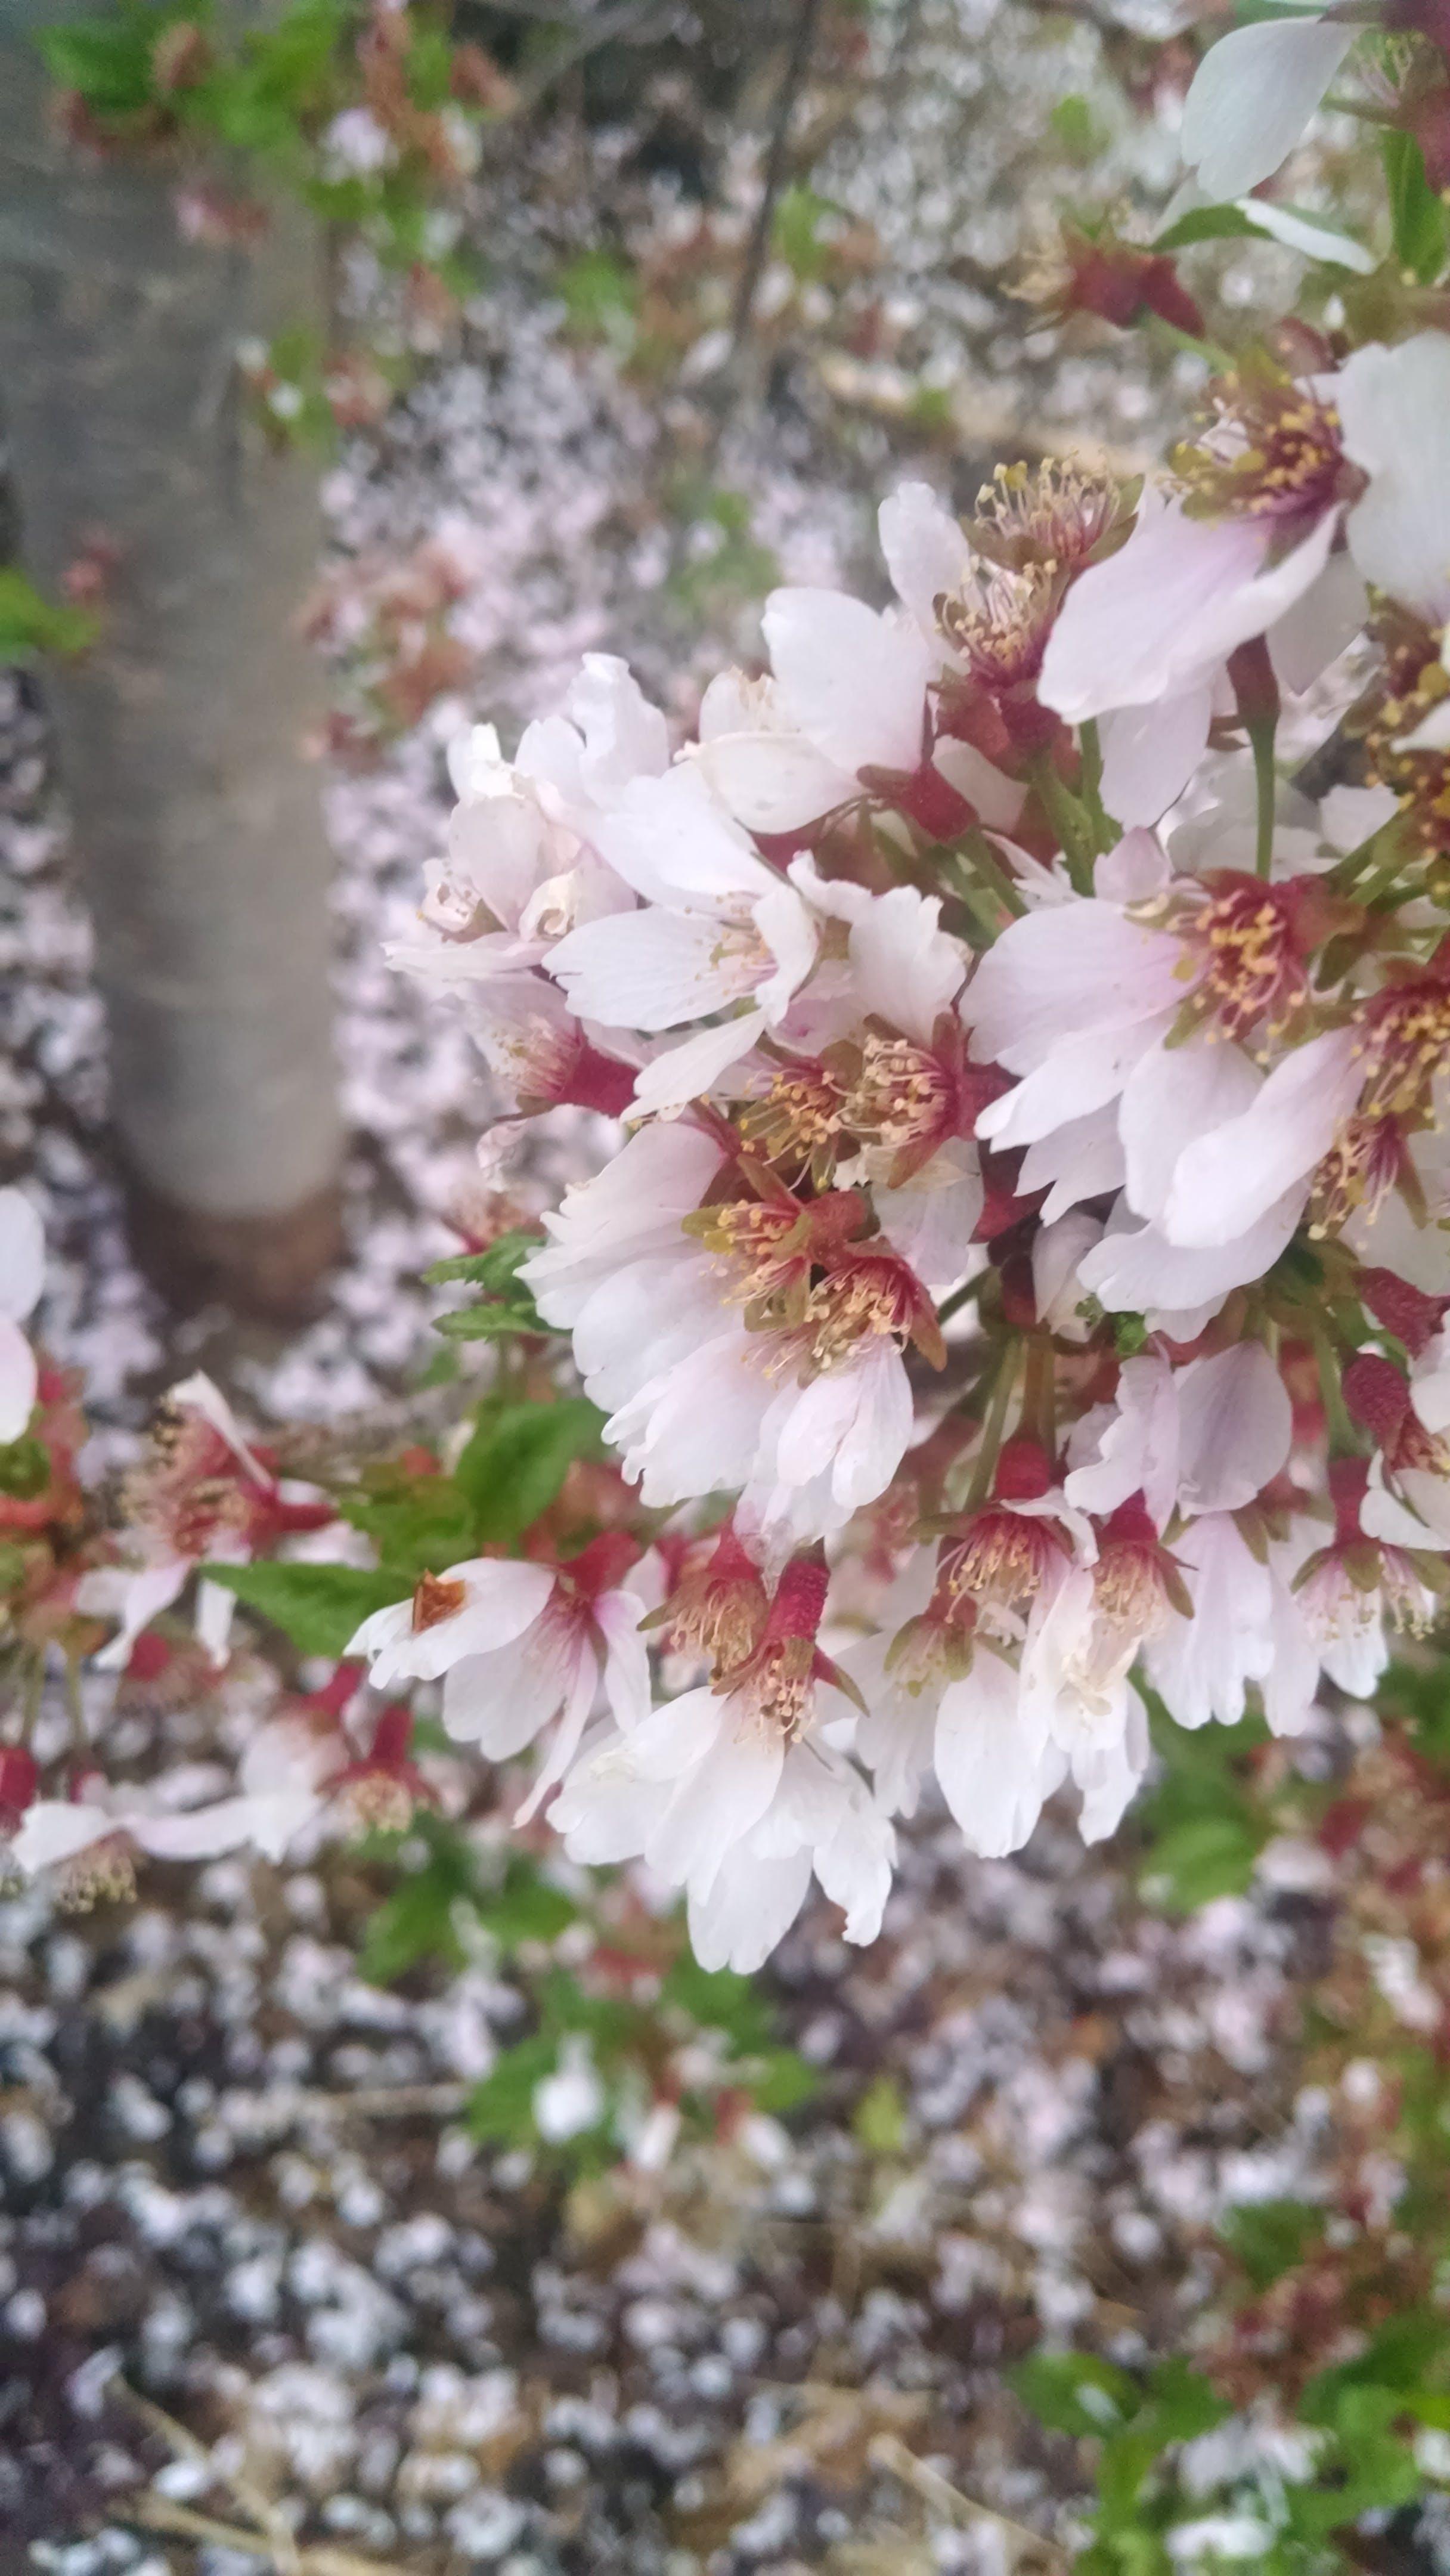 Free stock photo of flowers, bush, petals, tree